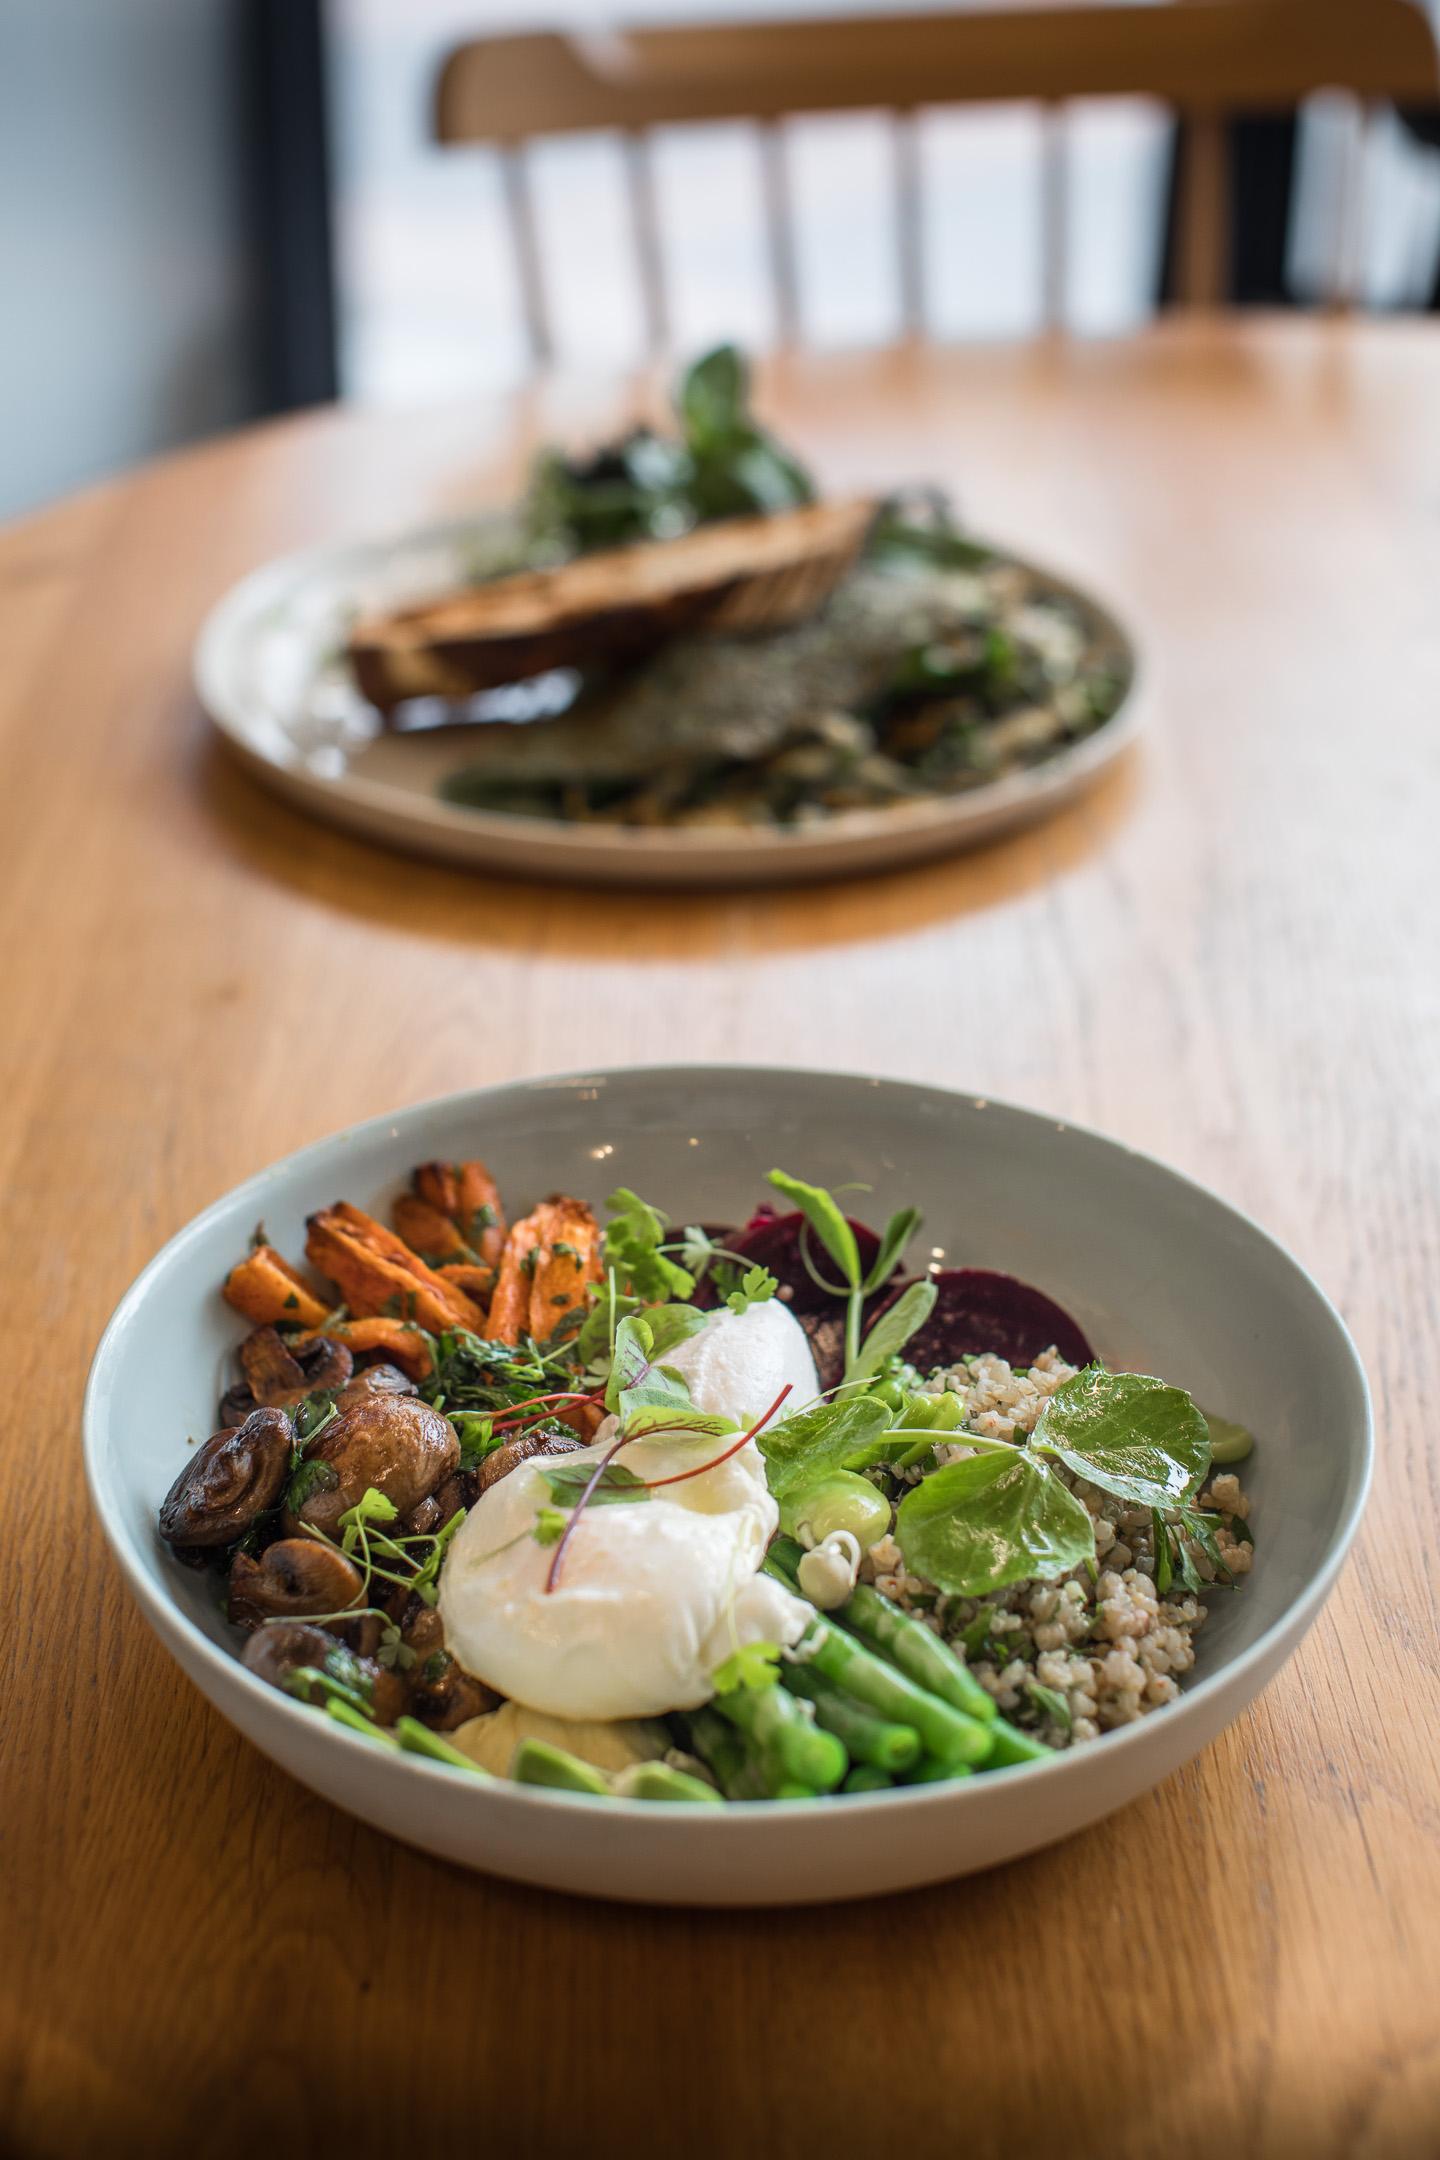 Sydney Food Photographer and Stylist